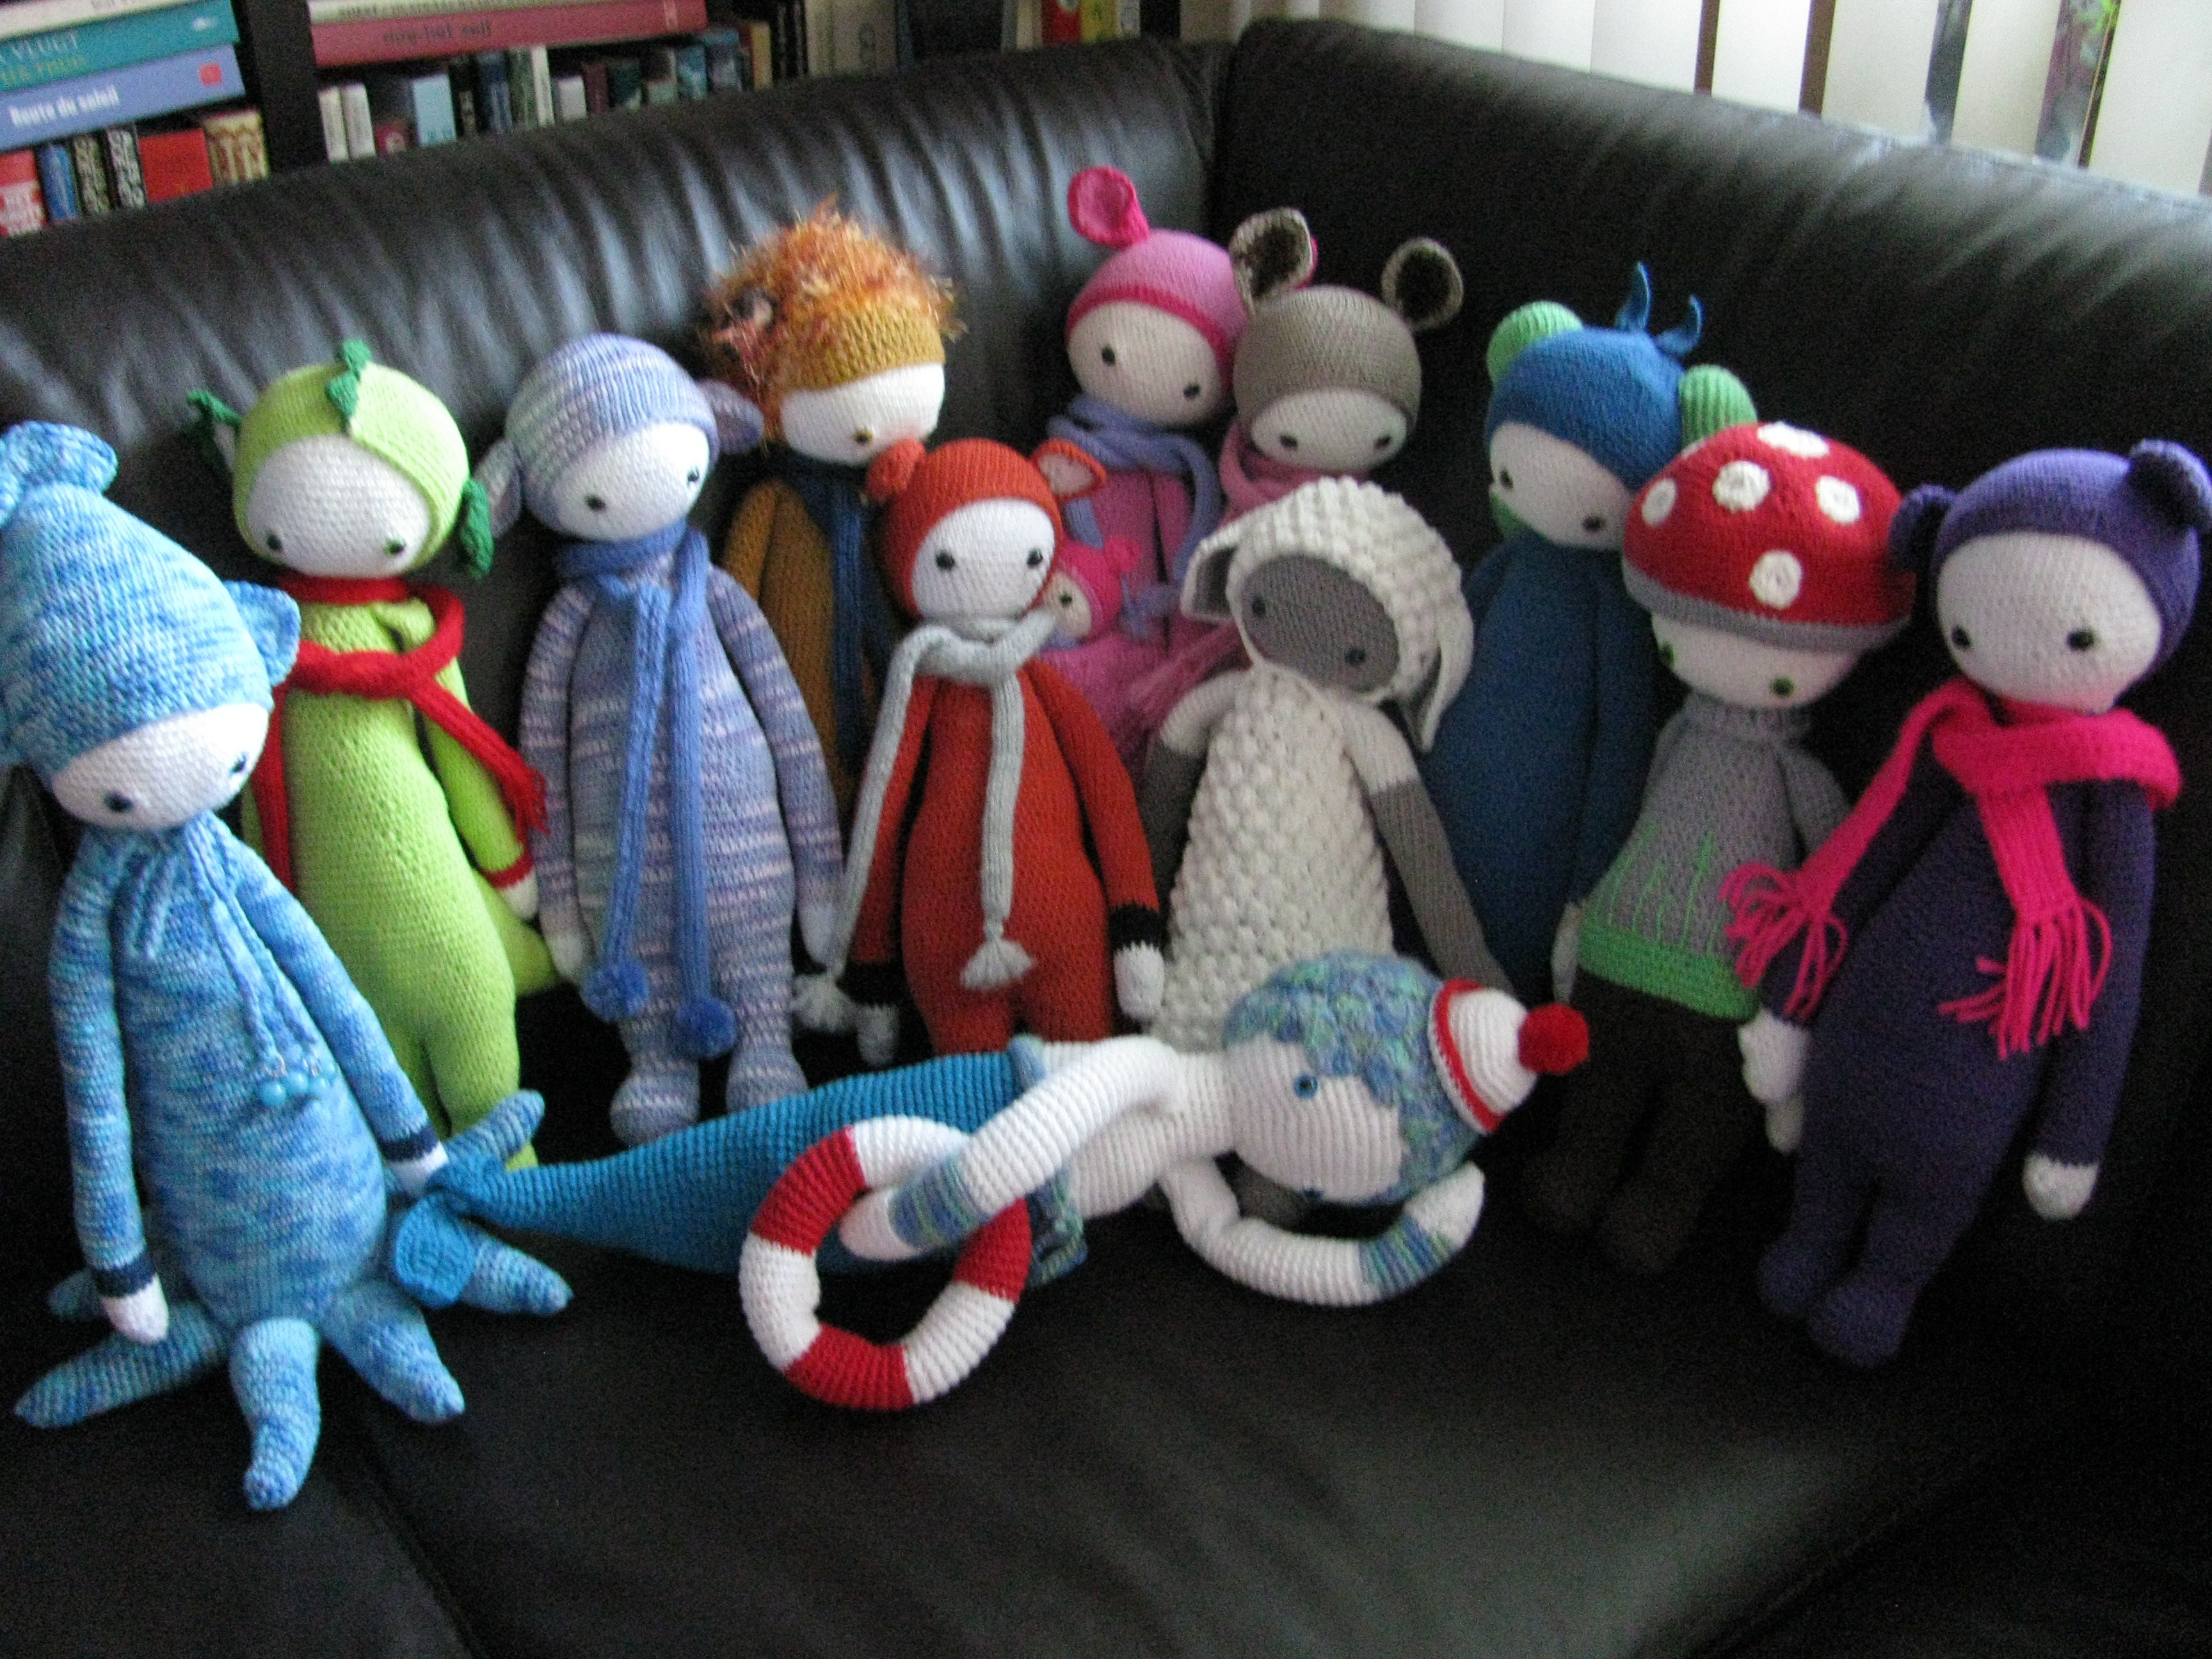 lalylala family made by Jane van der S. / crochet patterns by lalylala